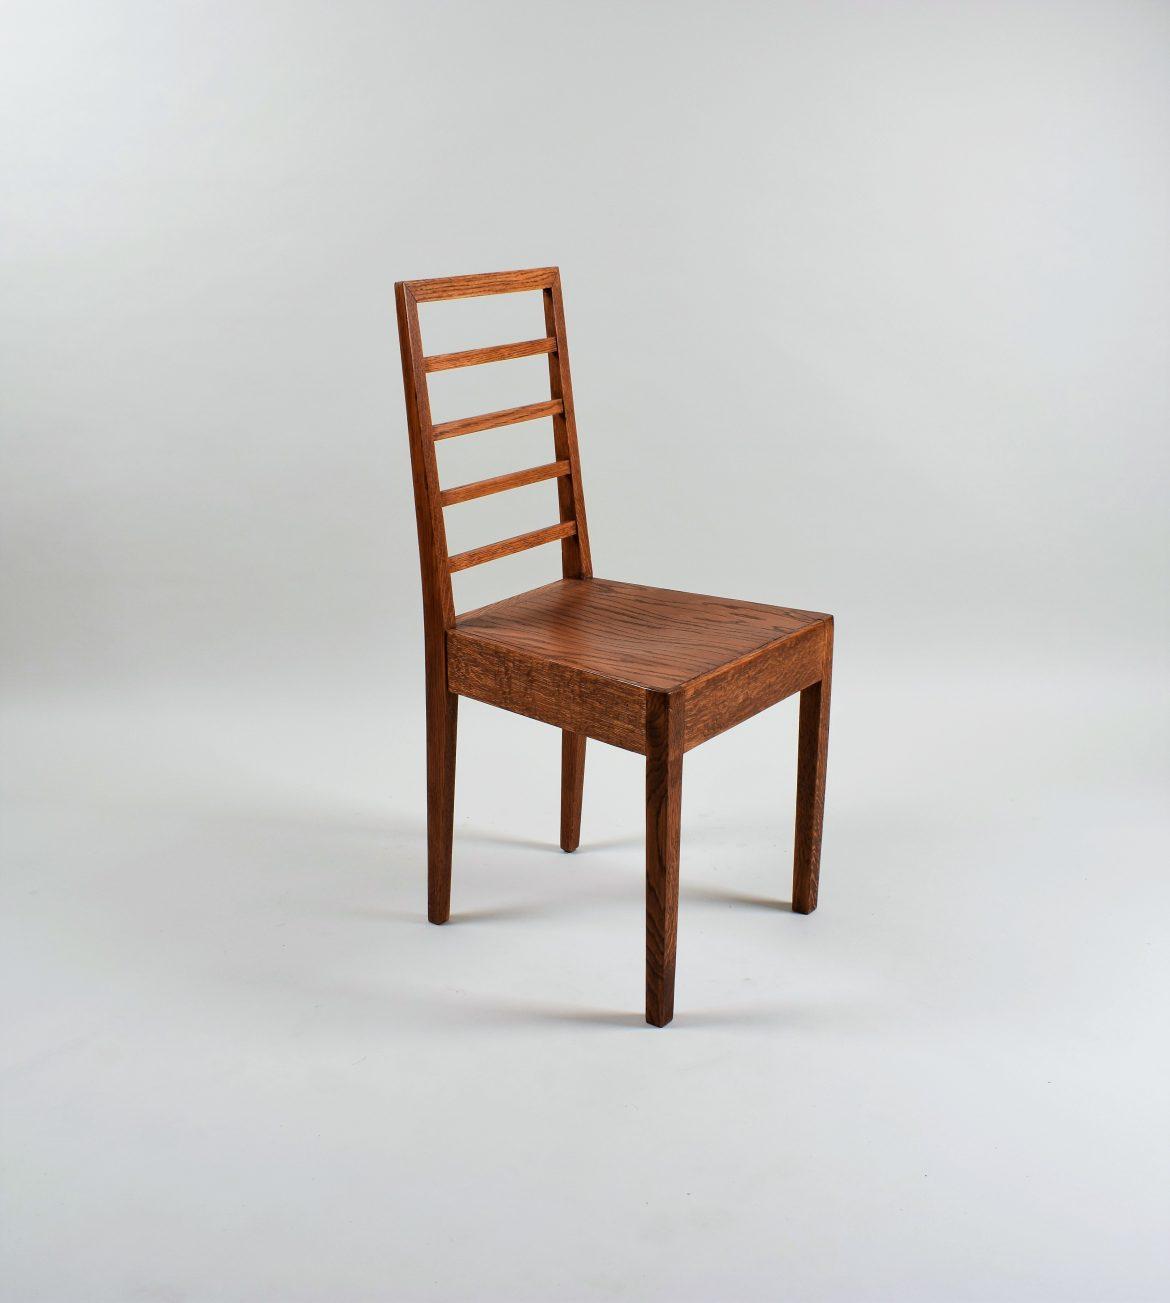 Railwaystation chair lemmetti for Eliel saarinen furniture